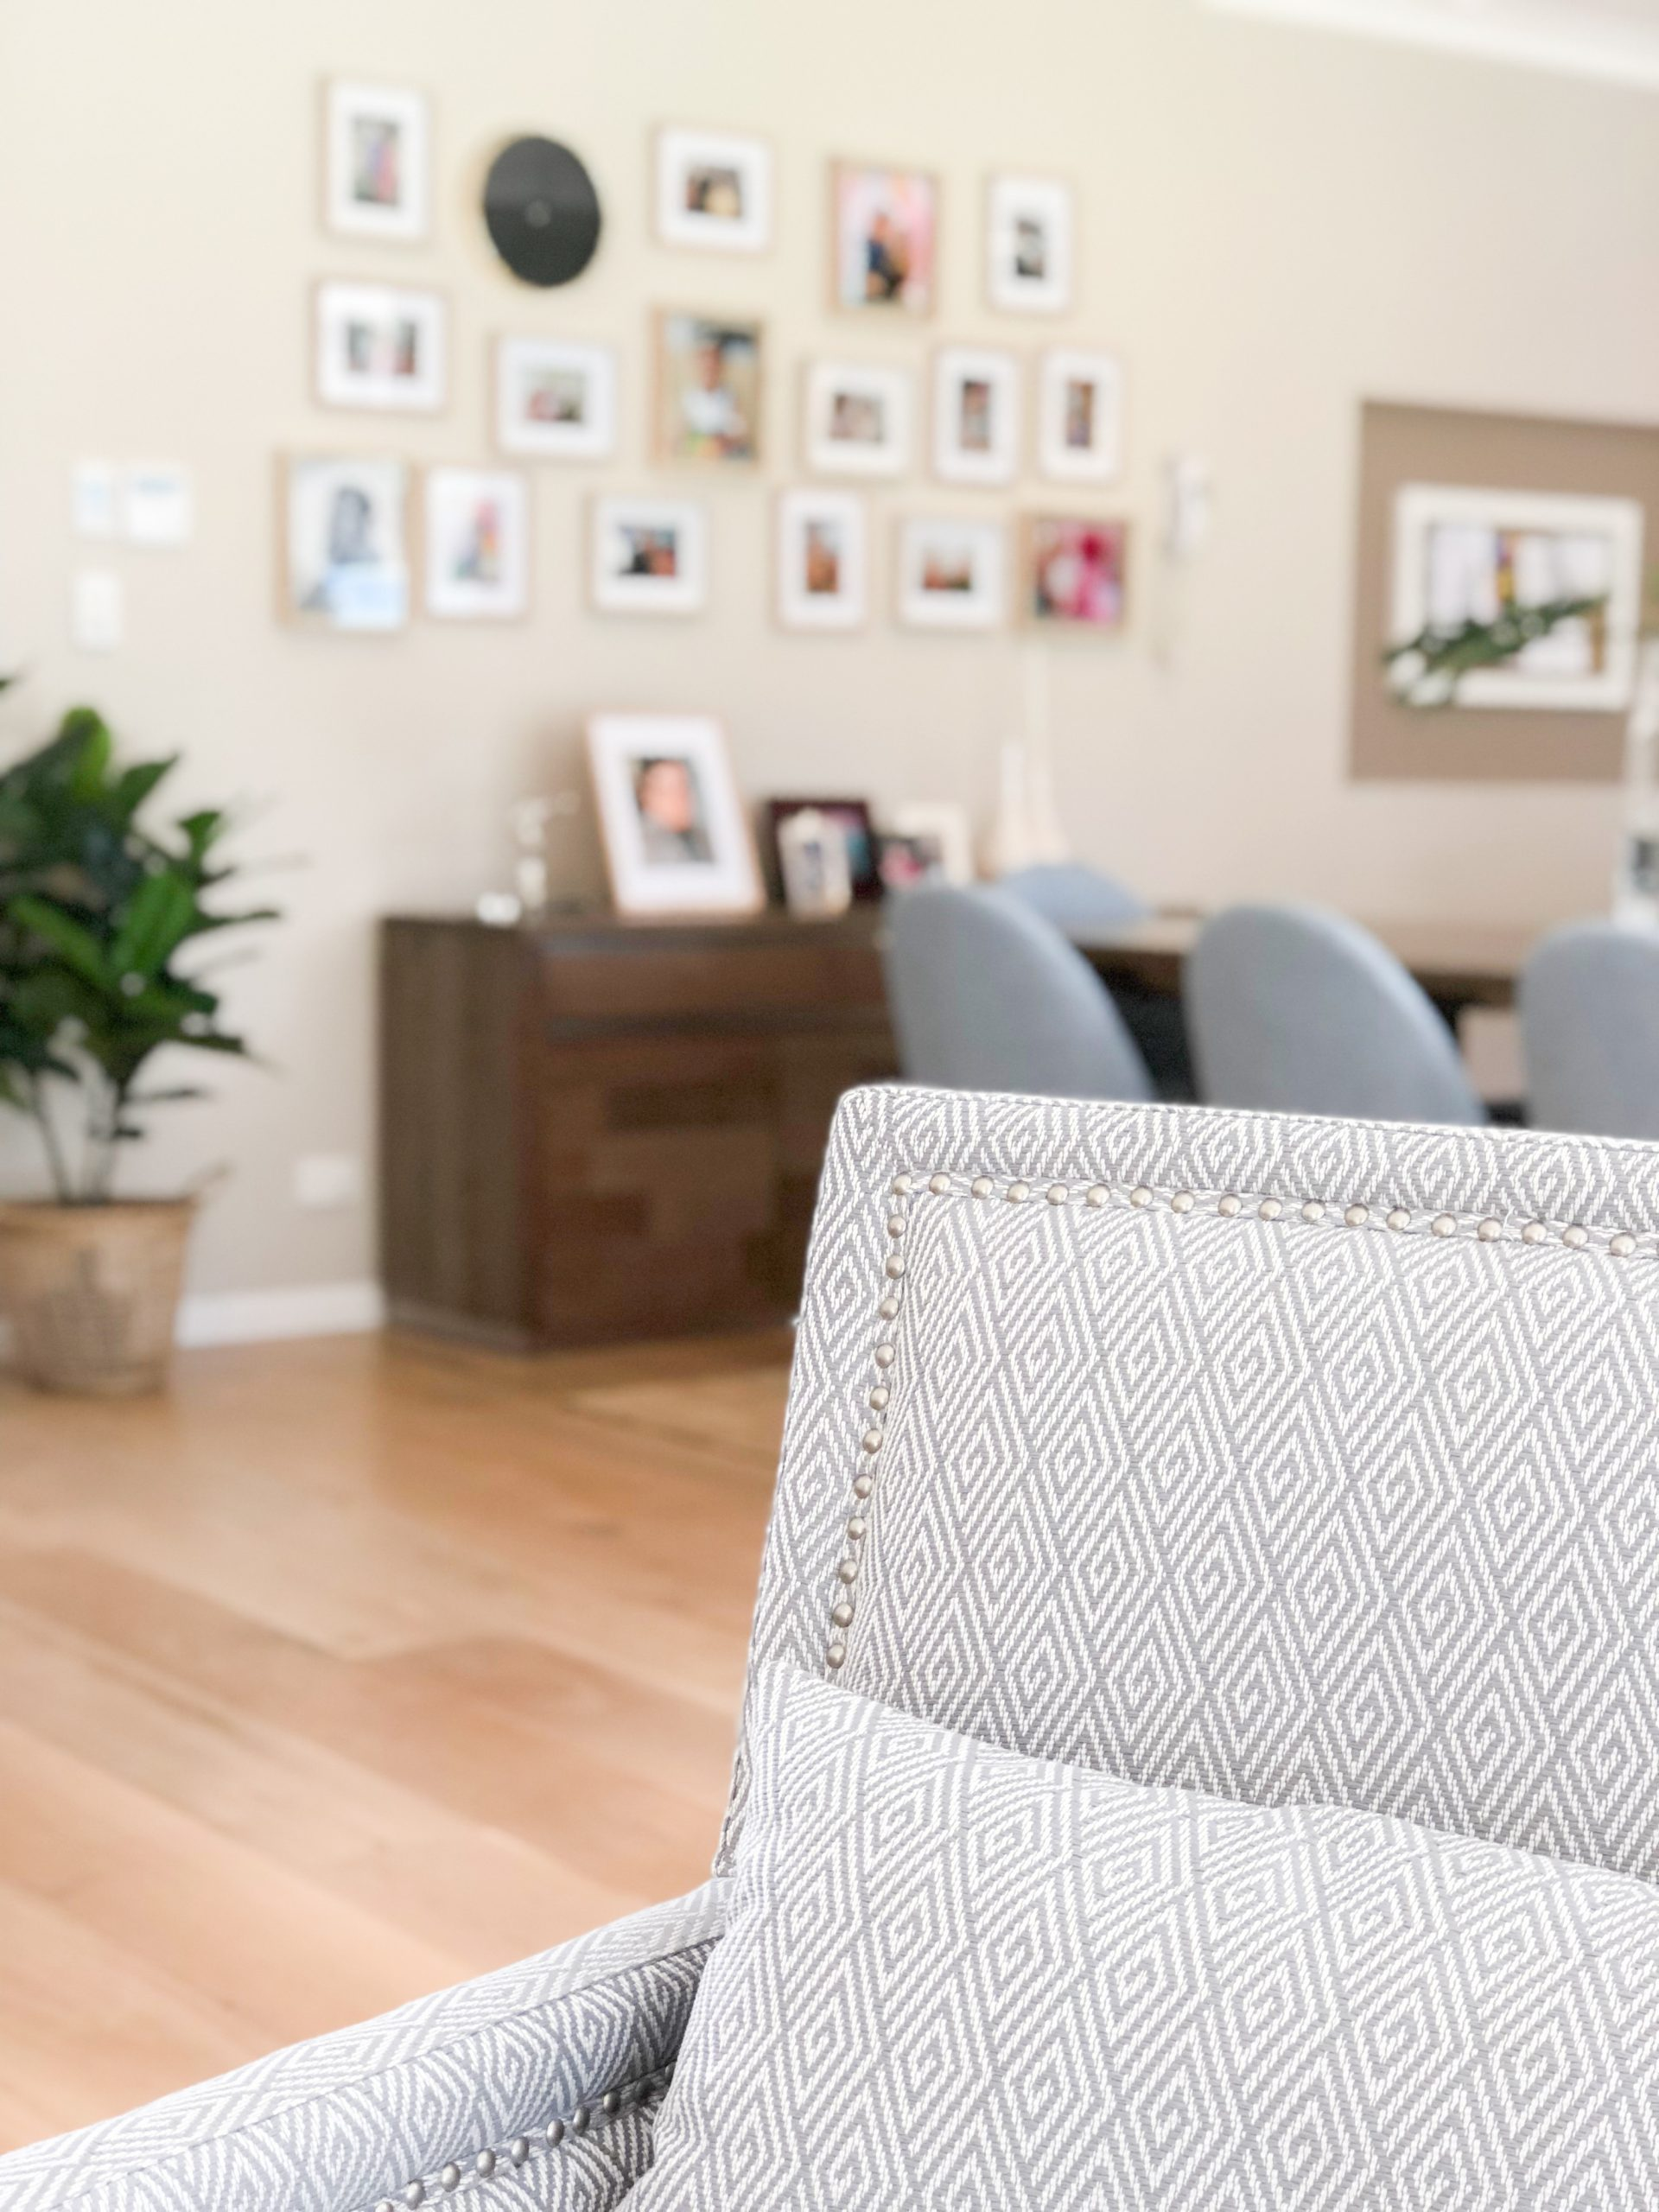 https://www.ivyandfinch.com.au/wp-content/uploads/2021/02/Interior-Design-Hope-Island-Custom-Chair-scaled.jpg